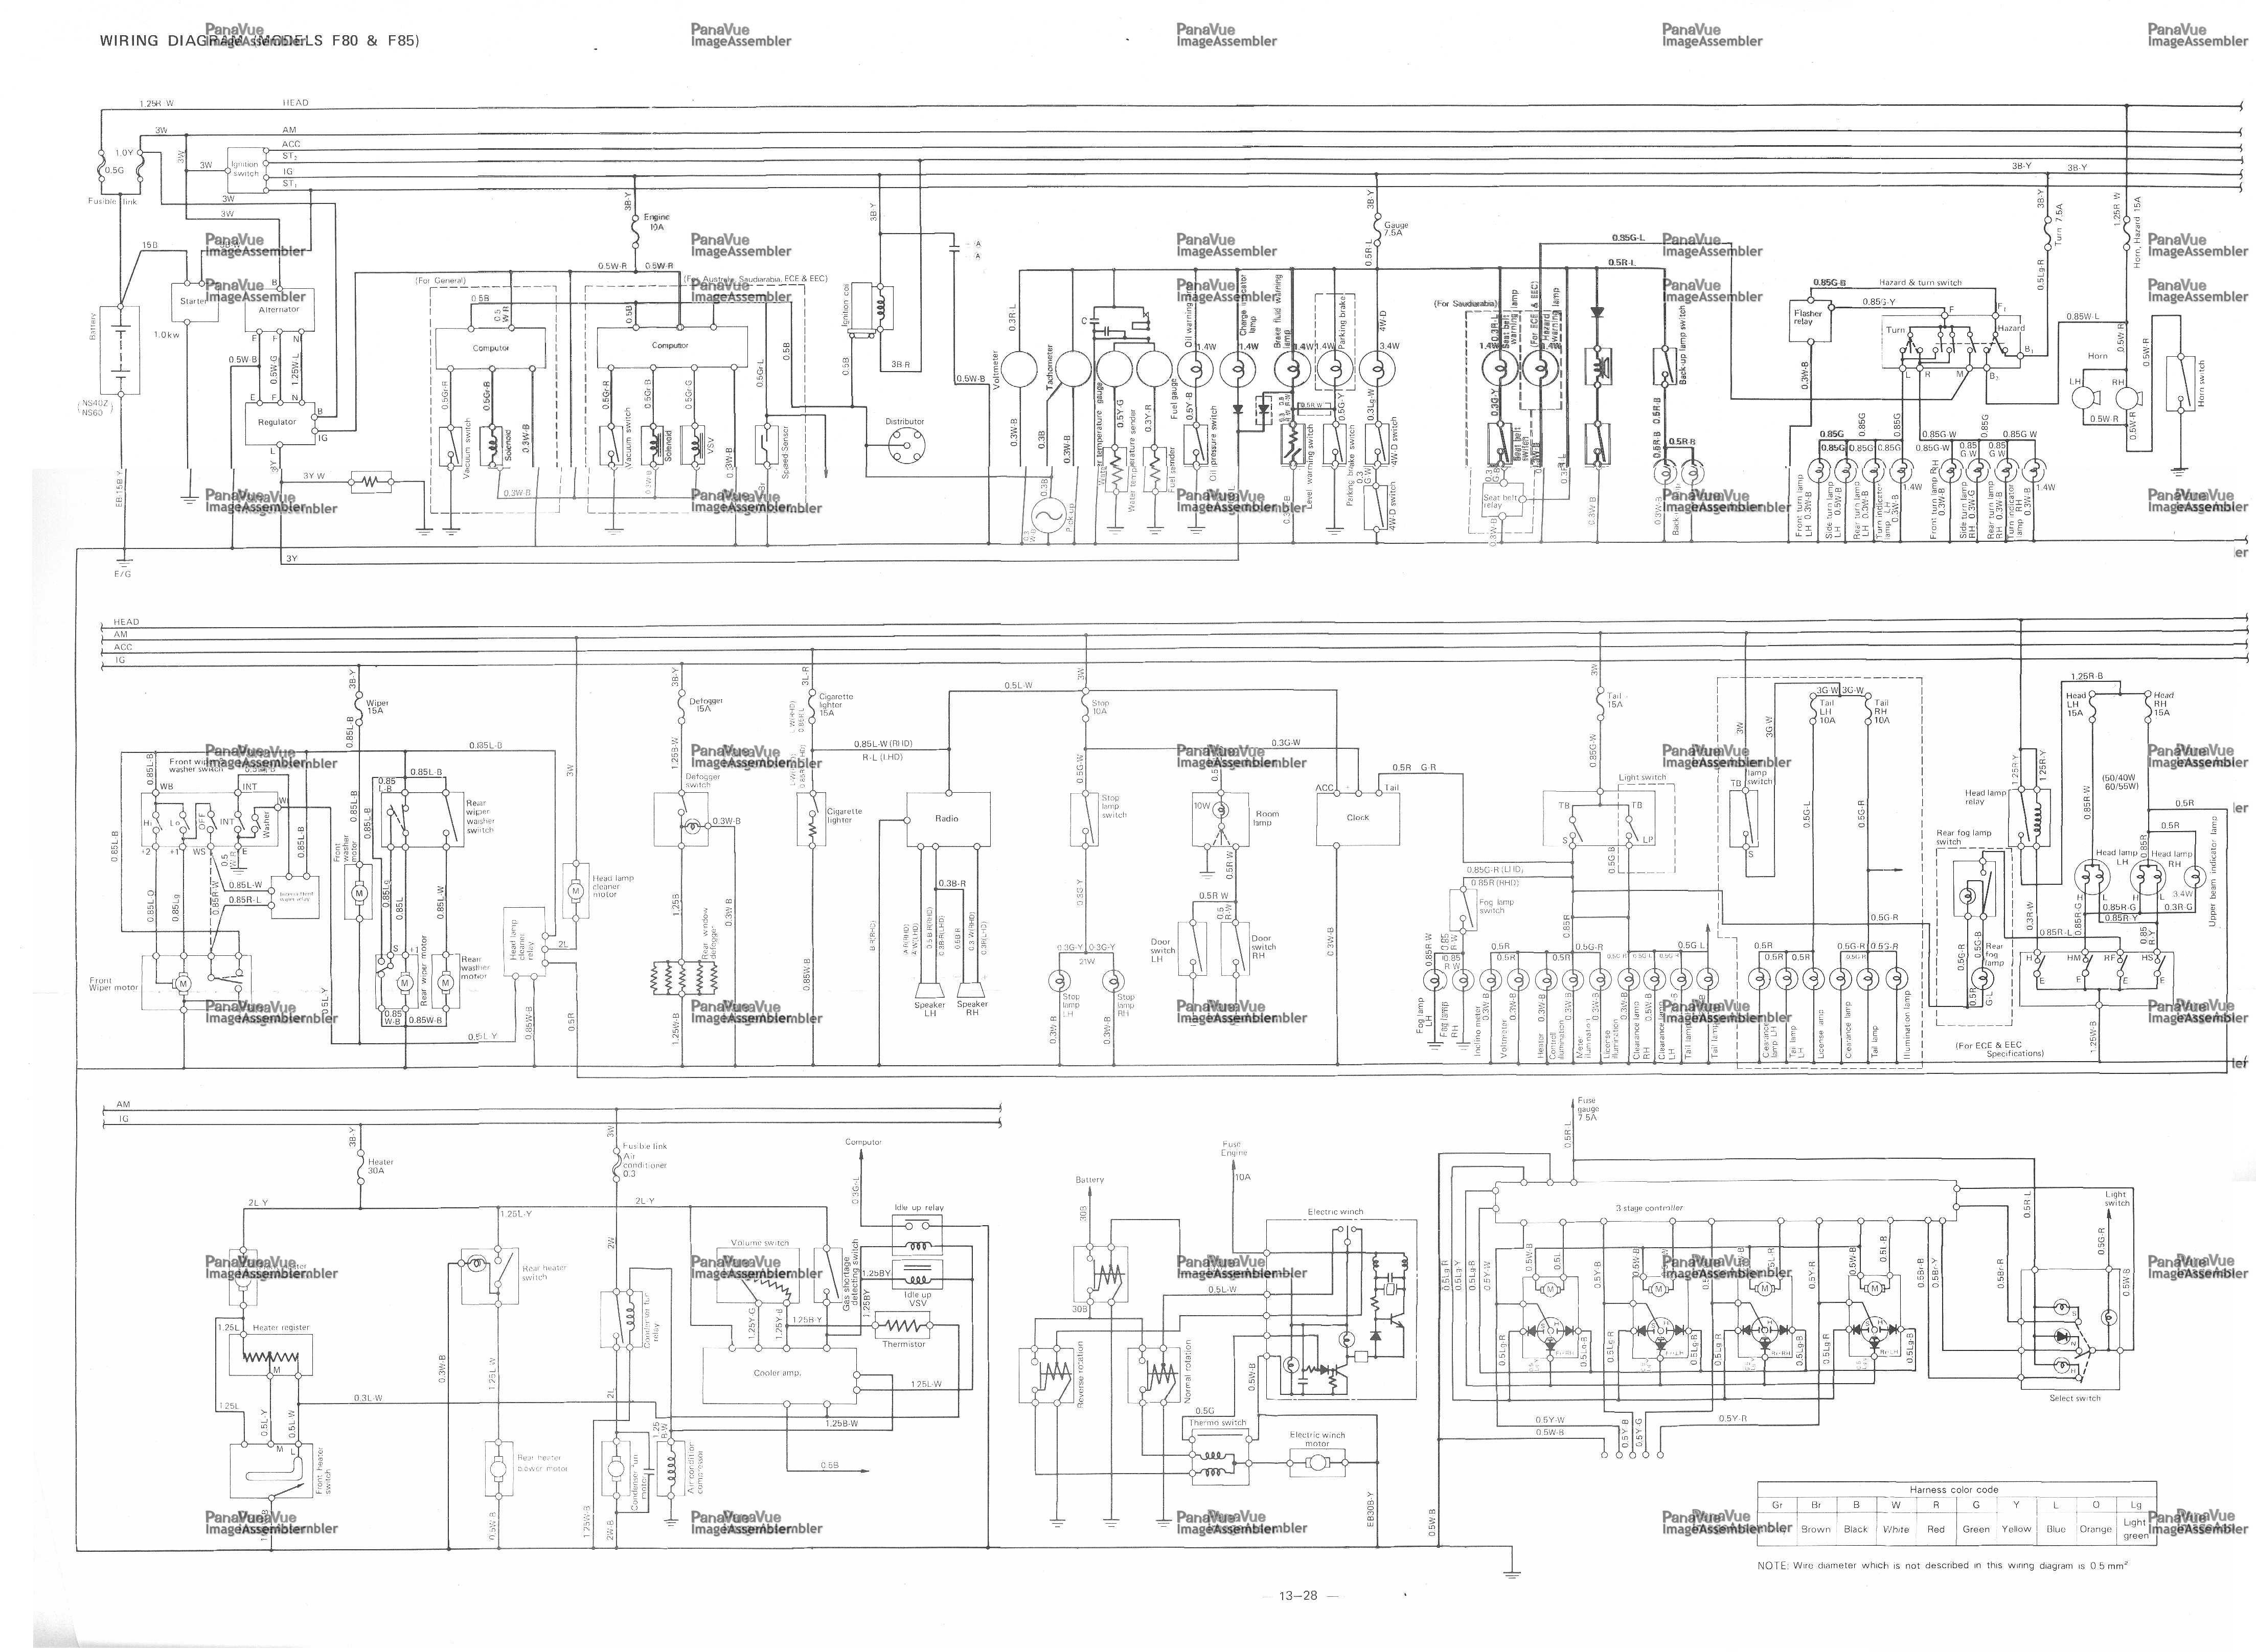 l7 wiring diagram e38 daihatsu info